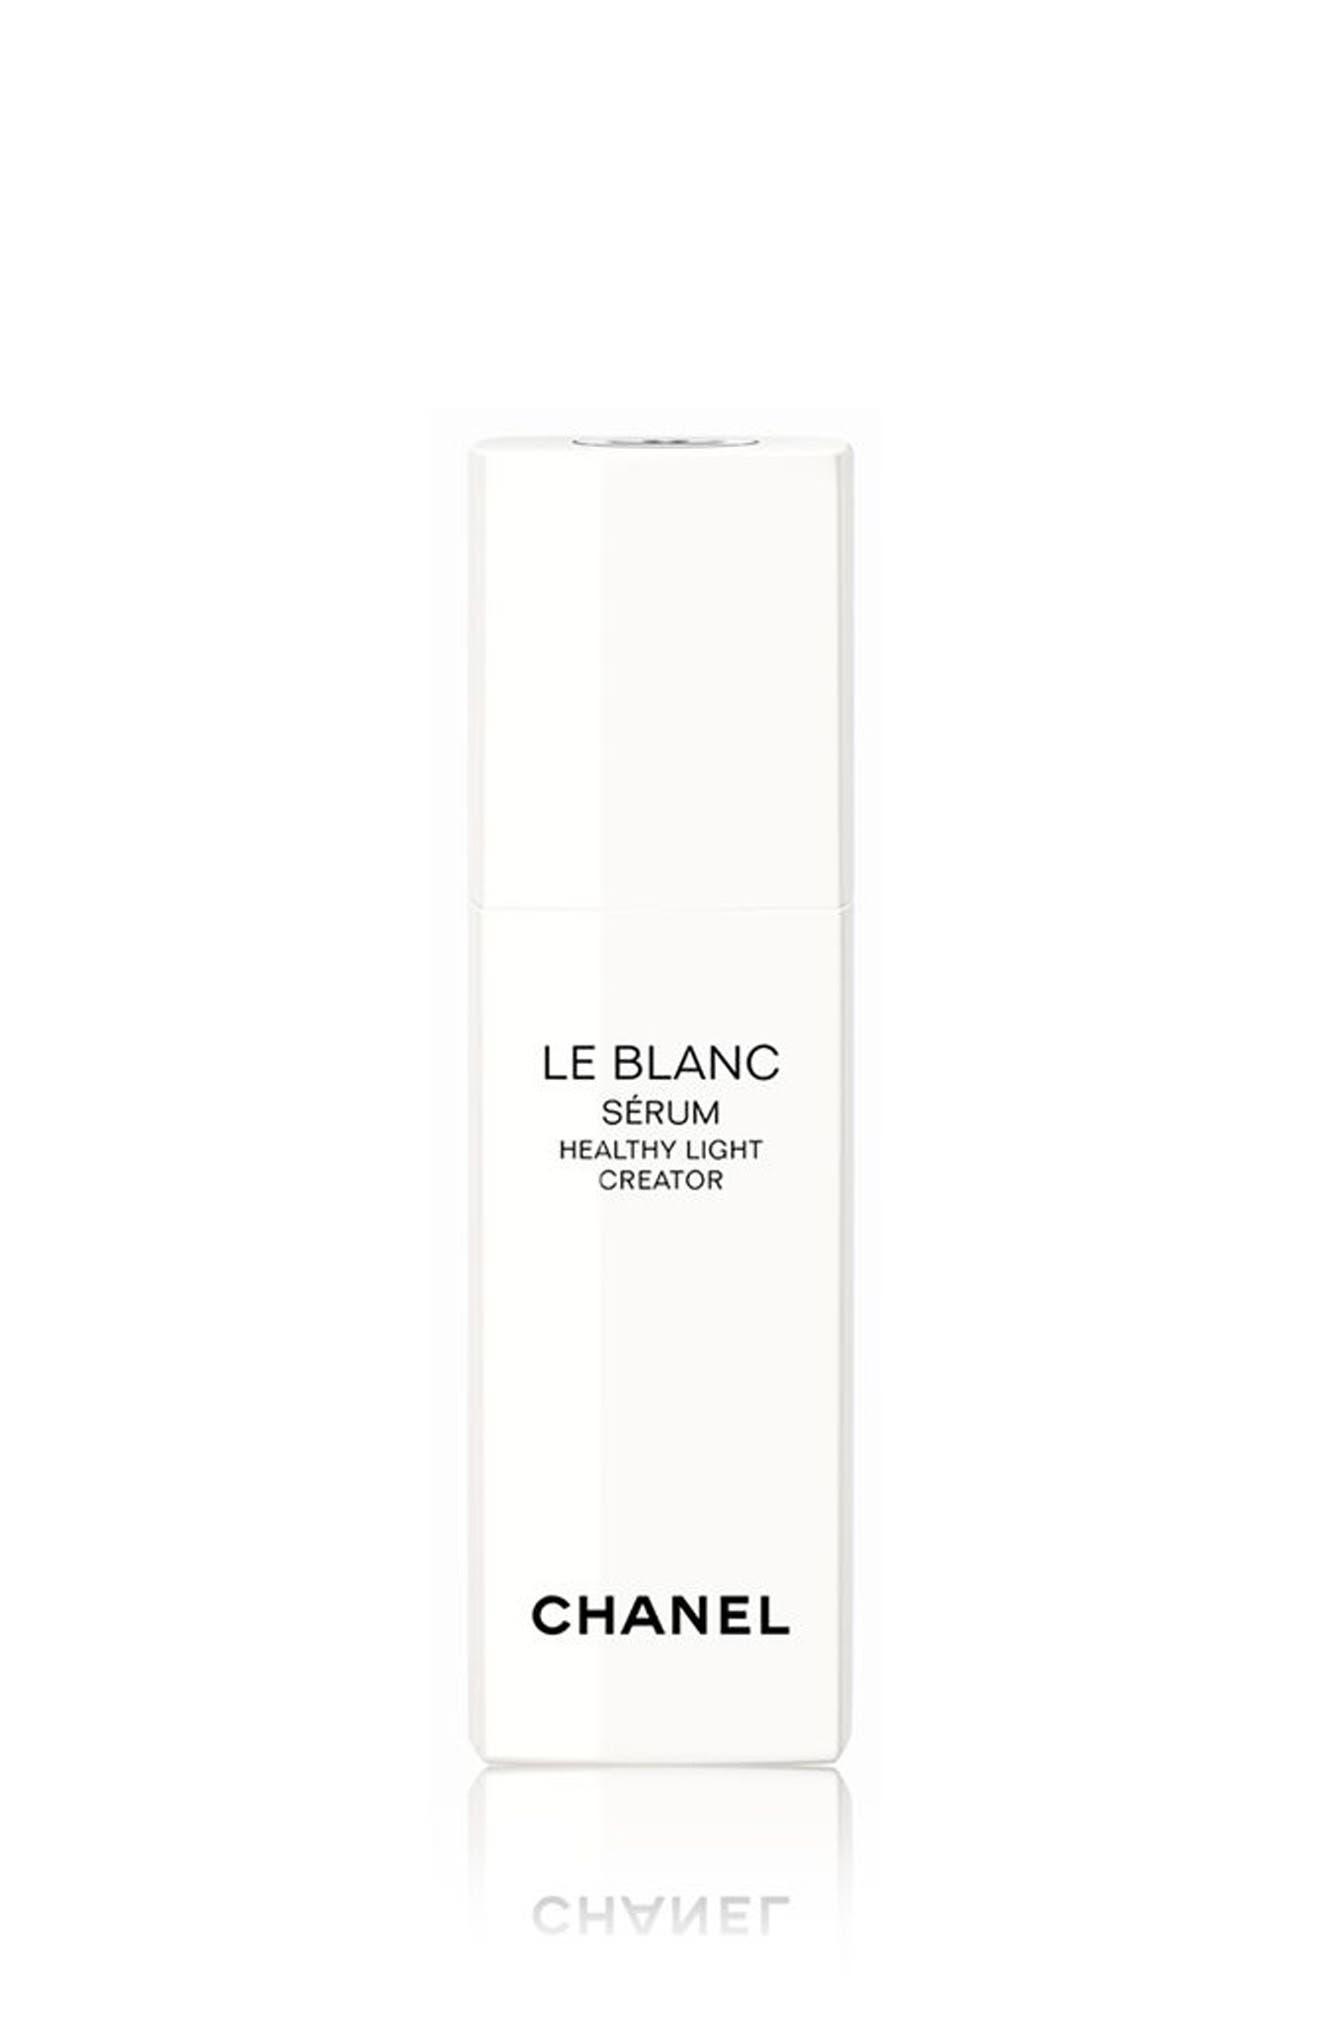 CHANEL LE BLANC SÉRUM  Healthy Light Creator